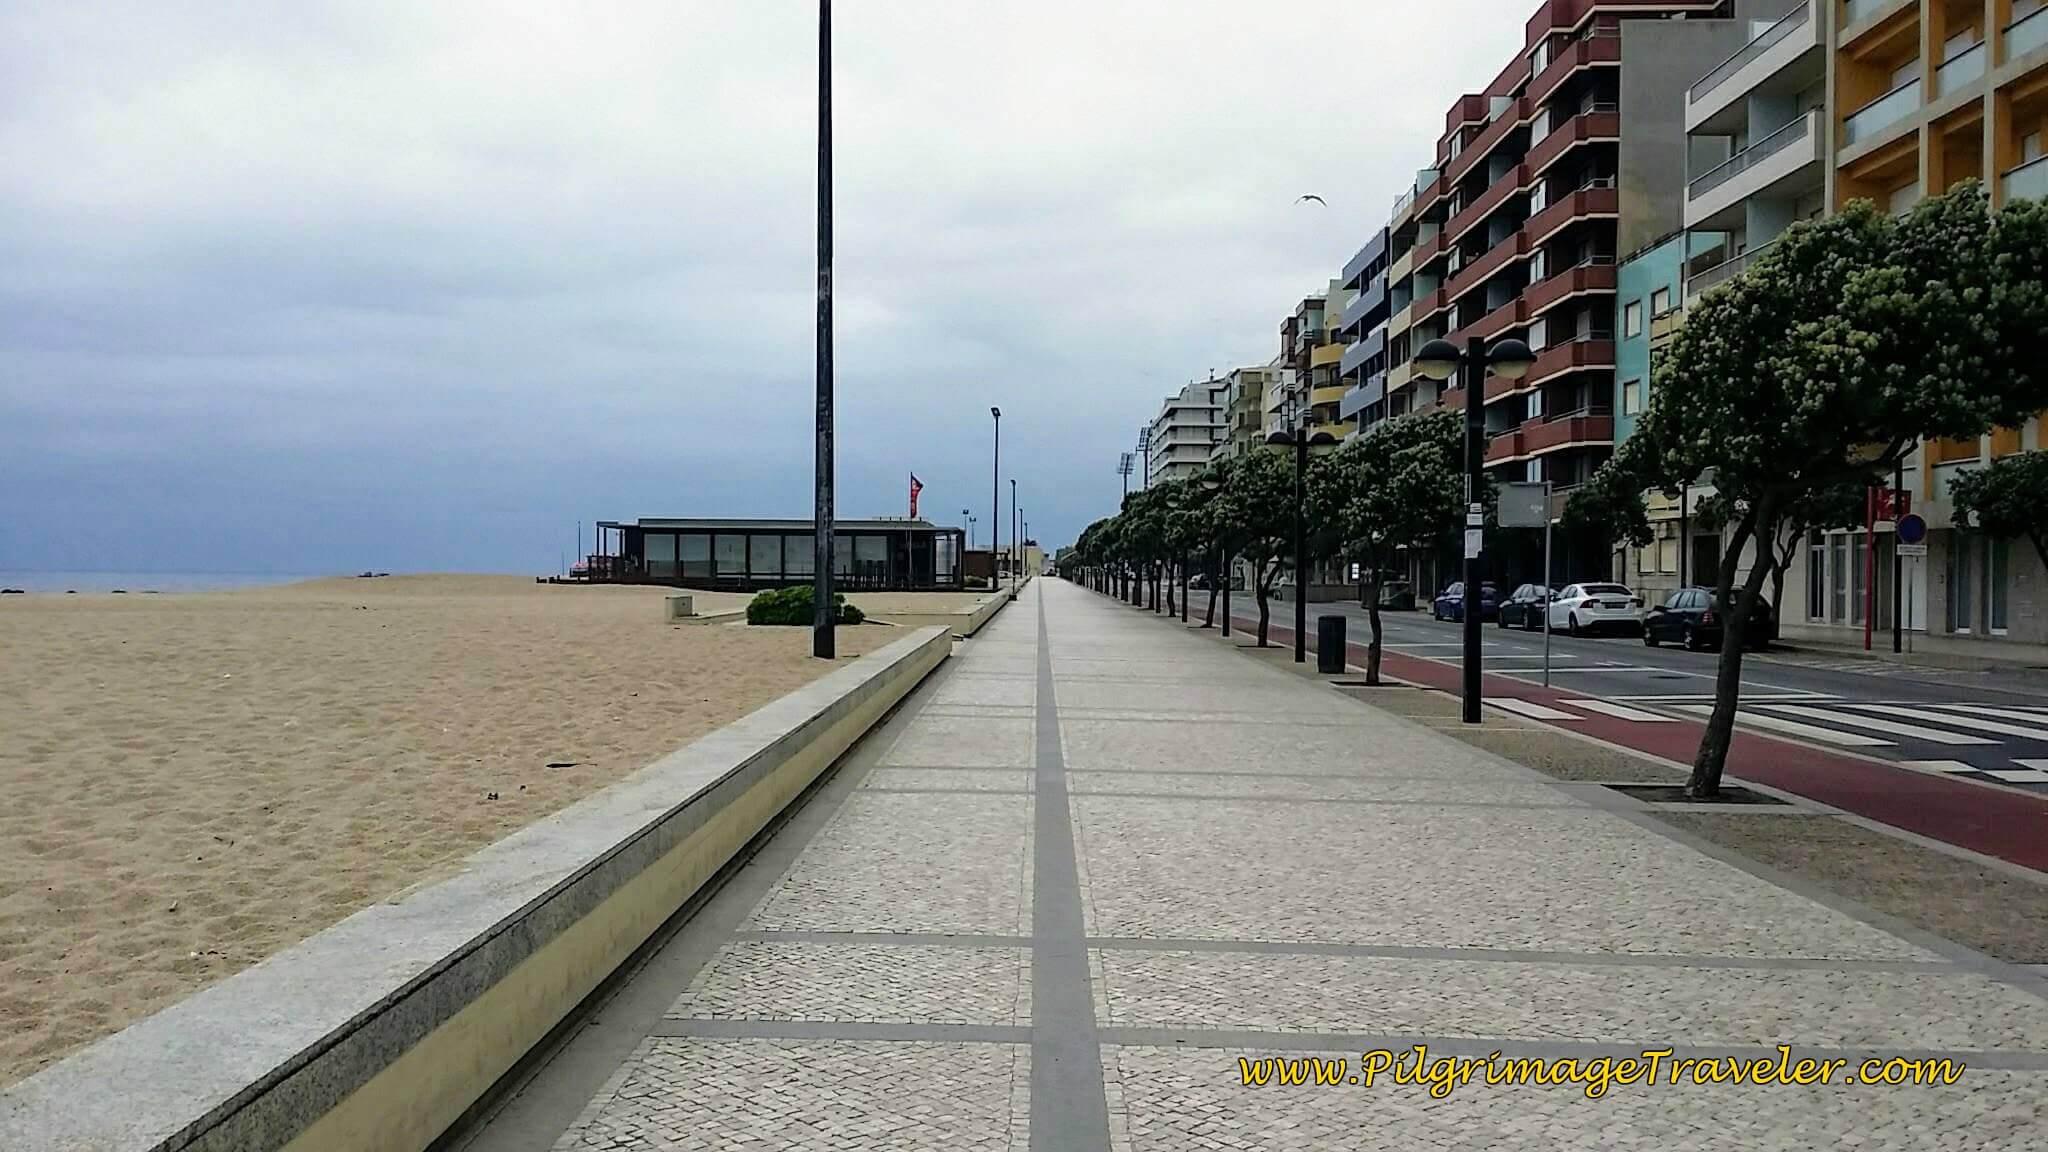 Promenade Along the Praia da Salgueira in Póvoa Varzim on day sixteen of the Camino Portugués on the Coastal Route